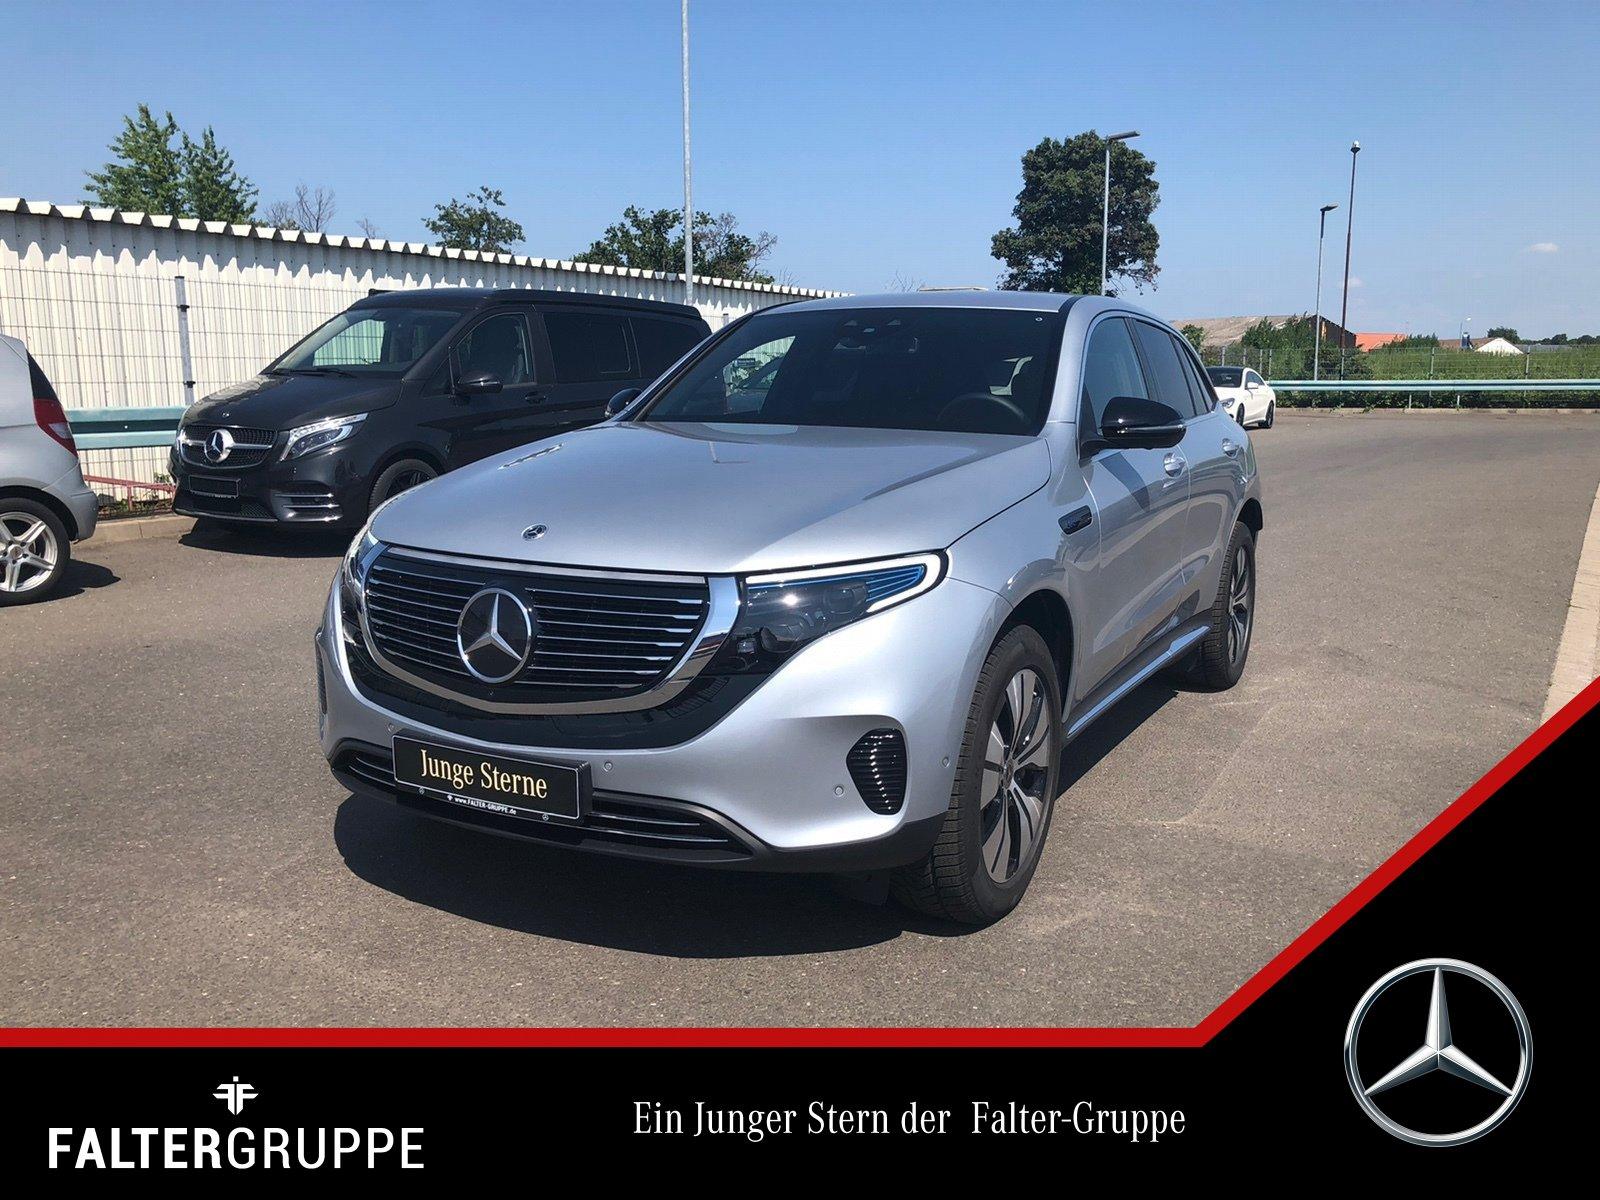 Mercedes-Benz EQC 400 79.272,-AMG Int.360°DISTRO 5.000,-BAFA, Jahr 2020, Elektro